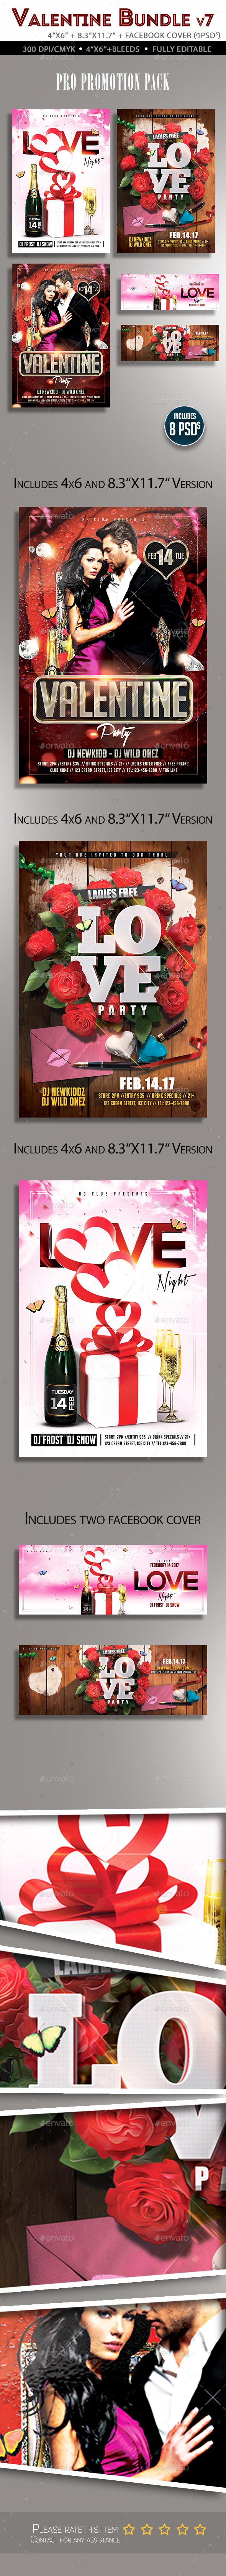 Valentine Flyer Bundle v7 - Clubs & Parties Events